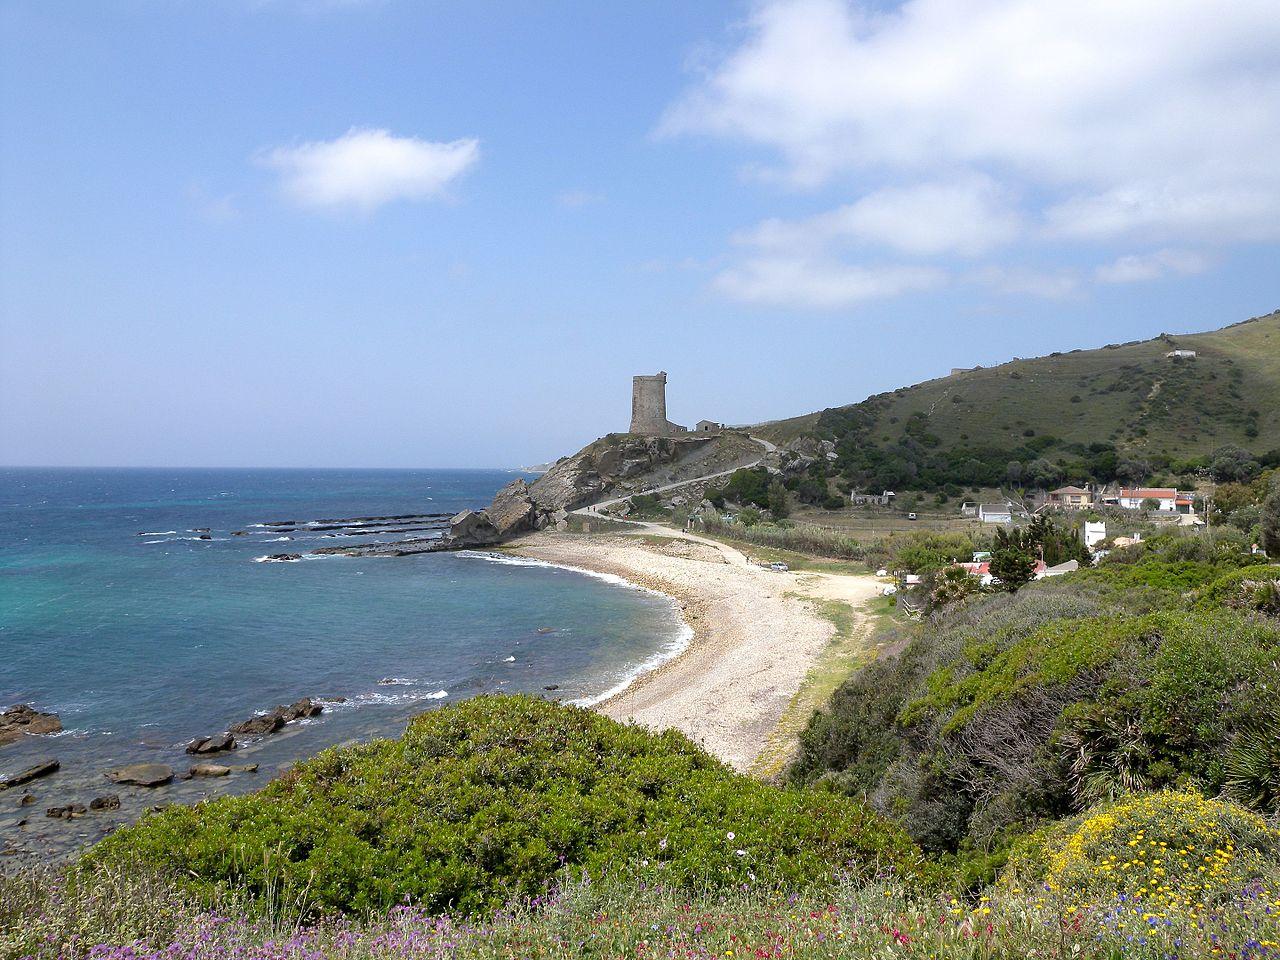 pontos turísticos de Tarifa